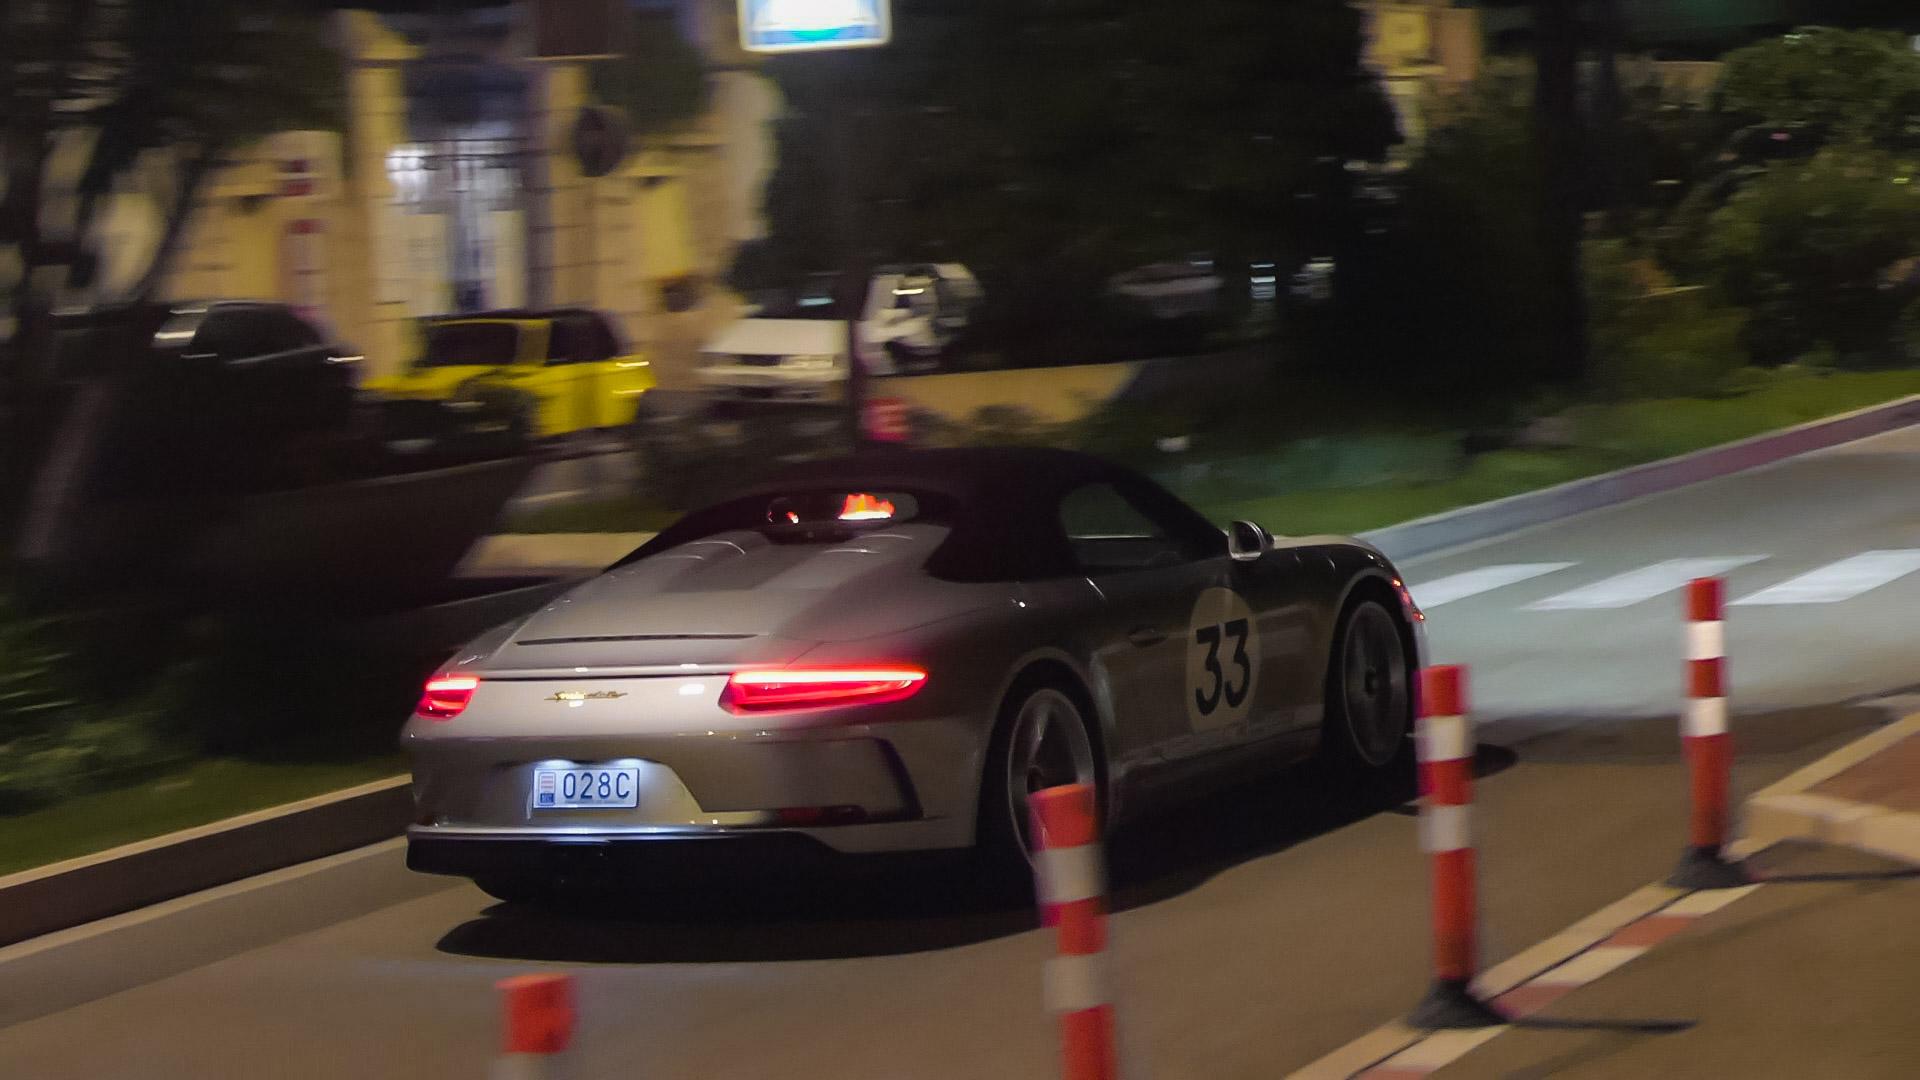 Porsche 991 Speedster - 028C (MC)